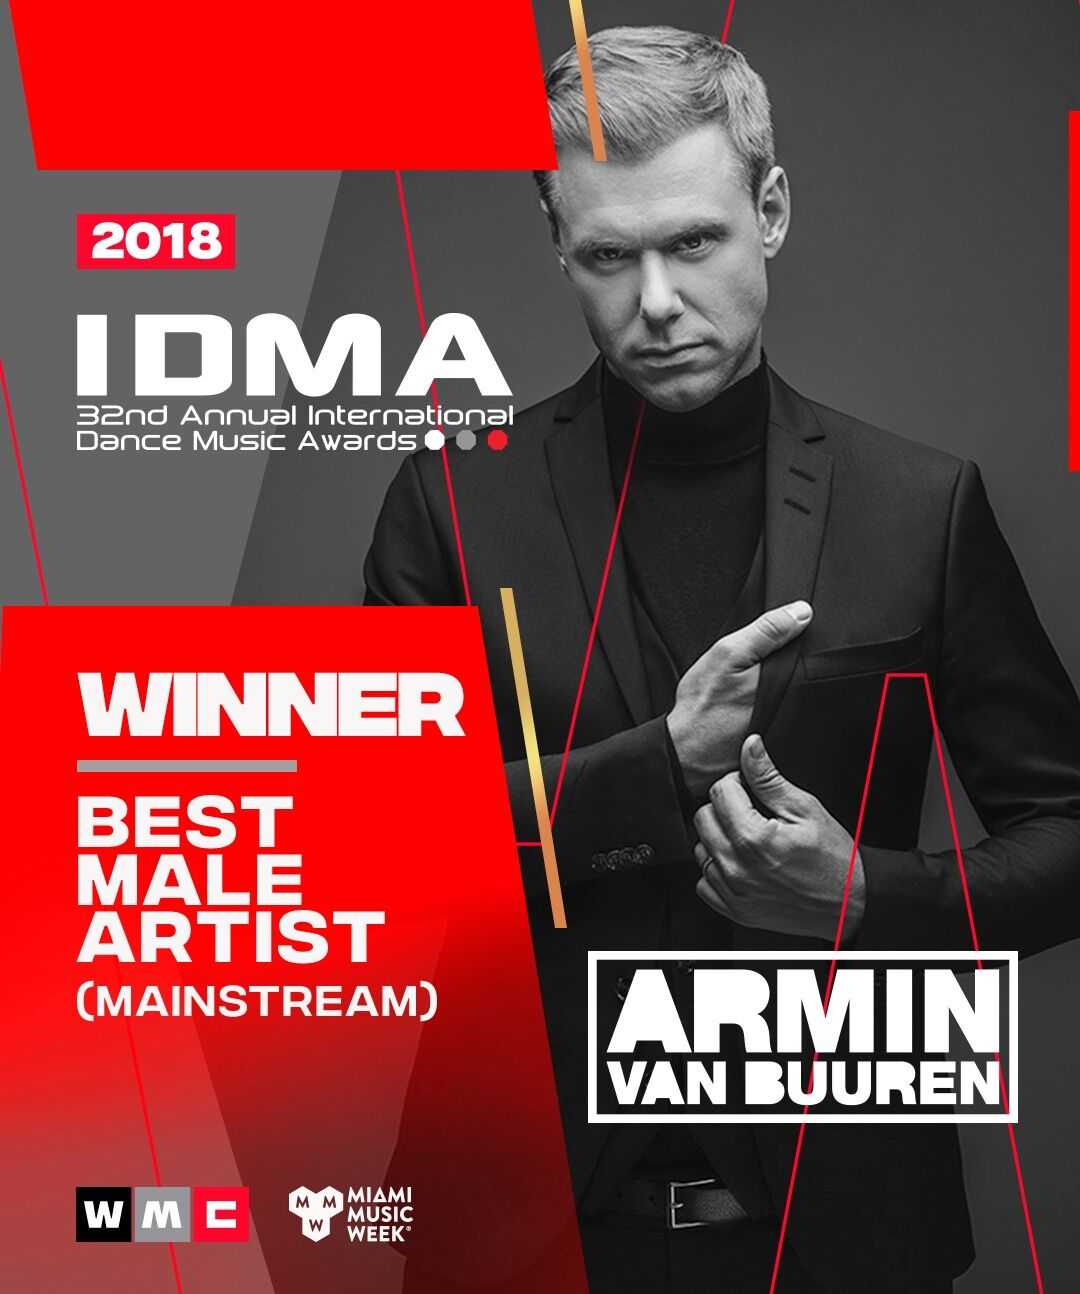 Armin van Buuren & Armada Music Win Big at IDMA 2018